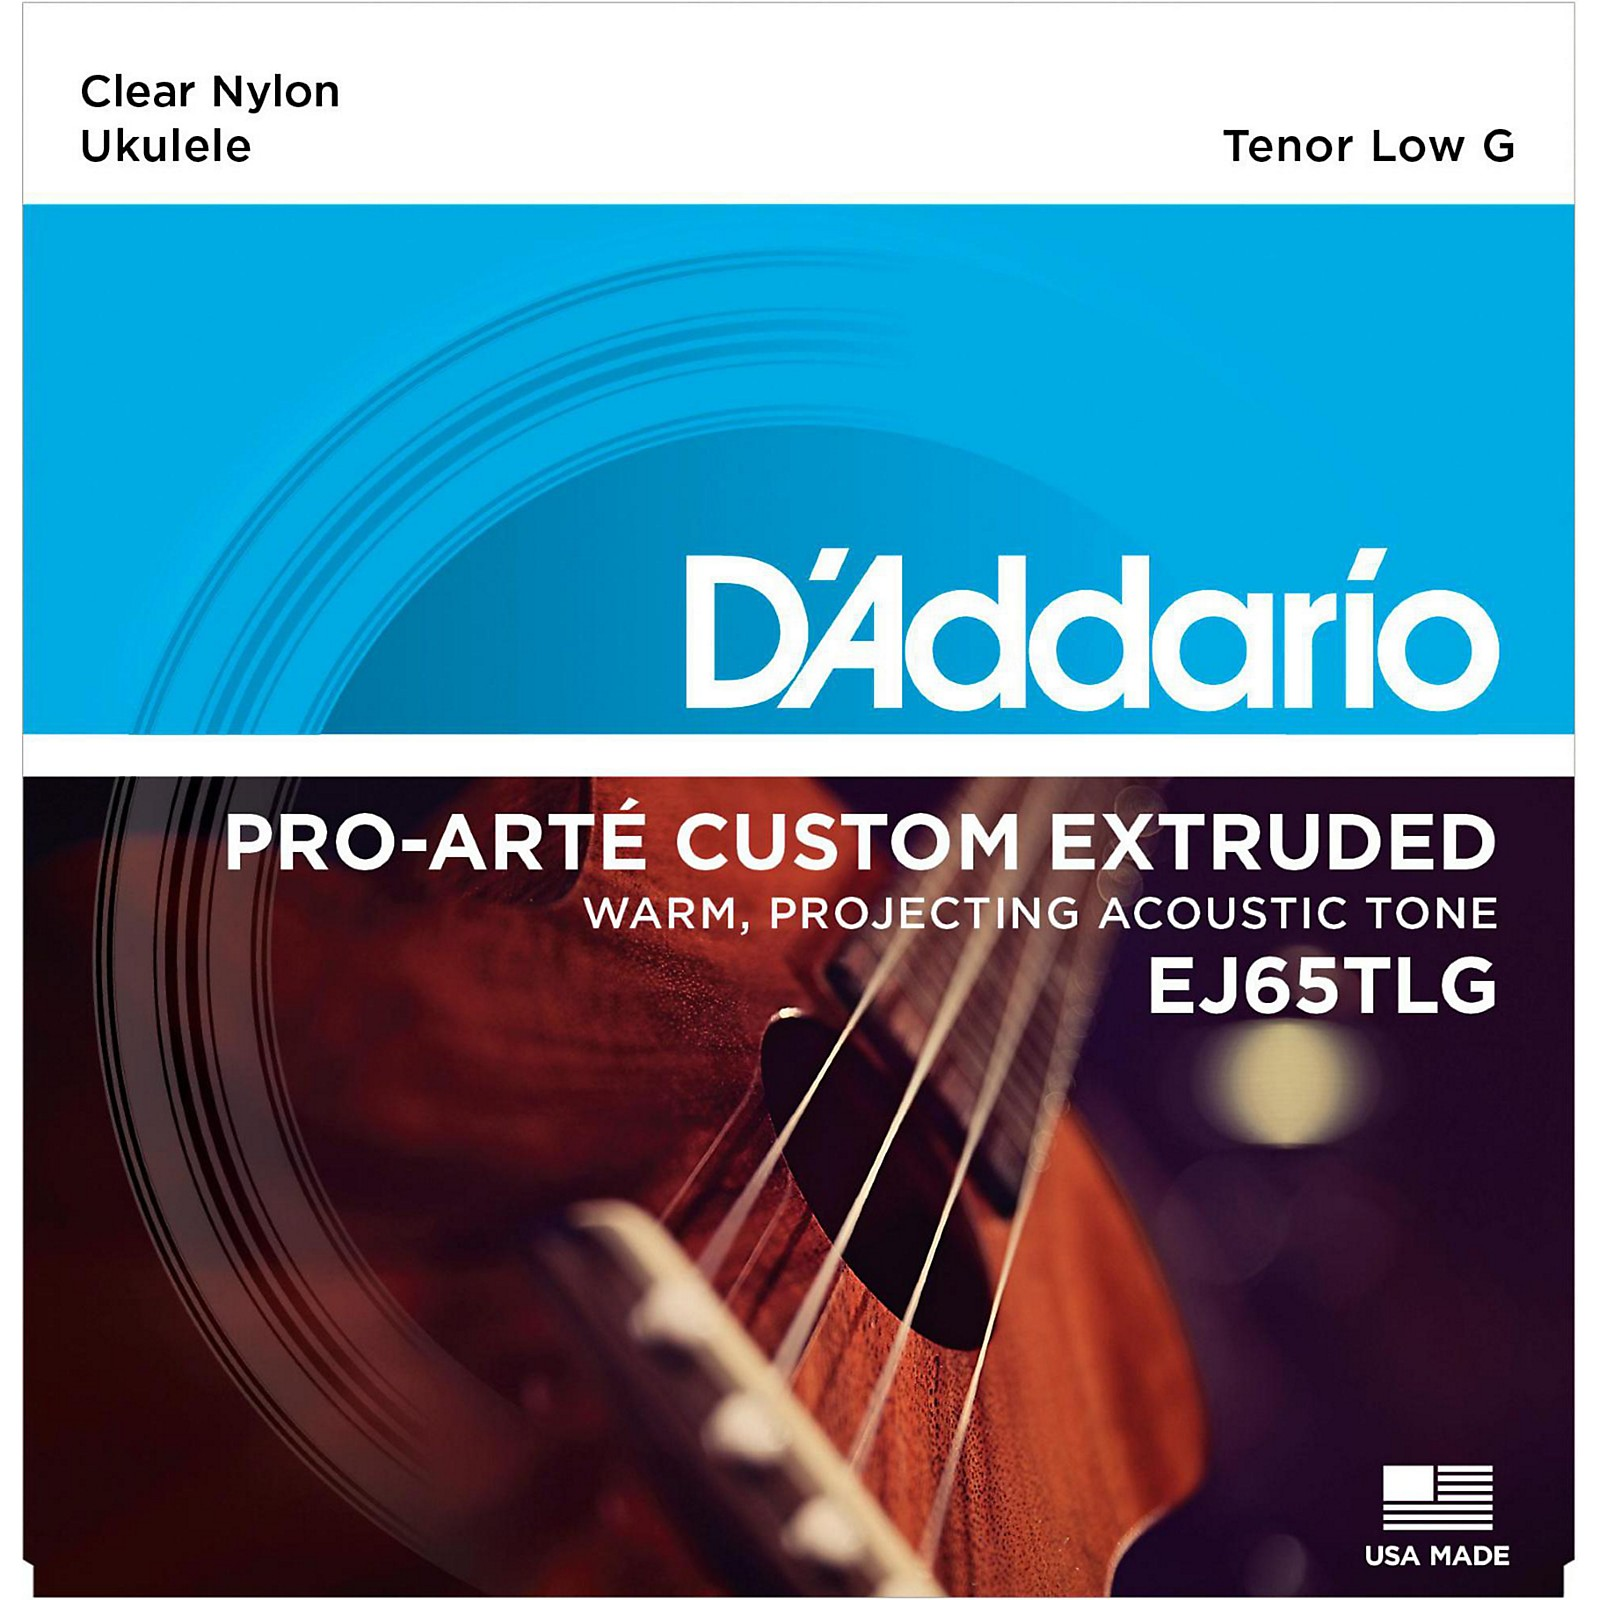 D'Addario EJ65TLG Pro-Arte Custom Extruded Tenor Low G Nylon Ukulele Strings